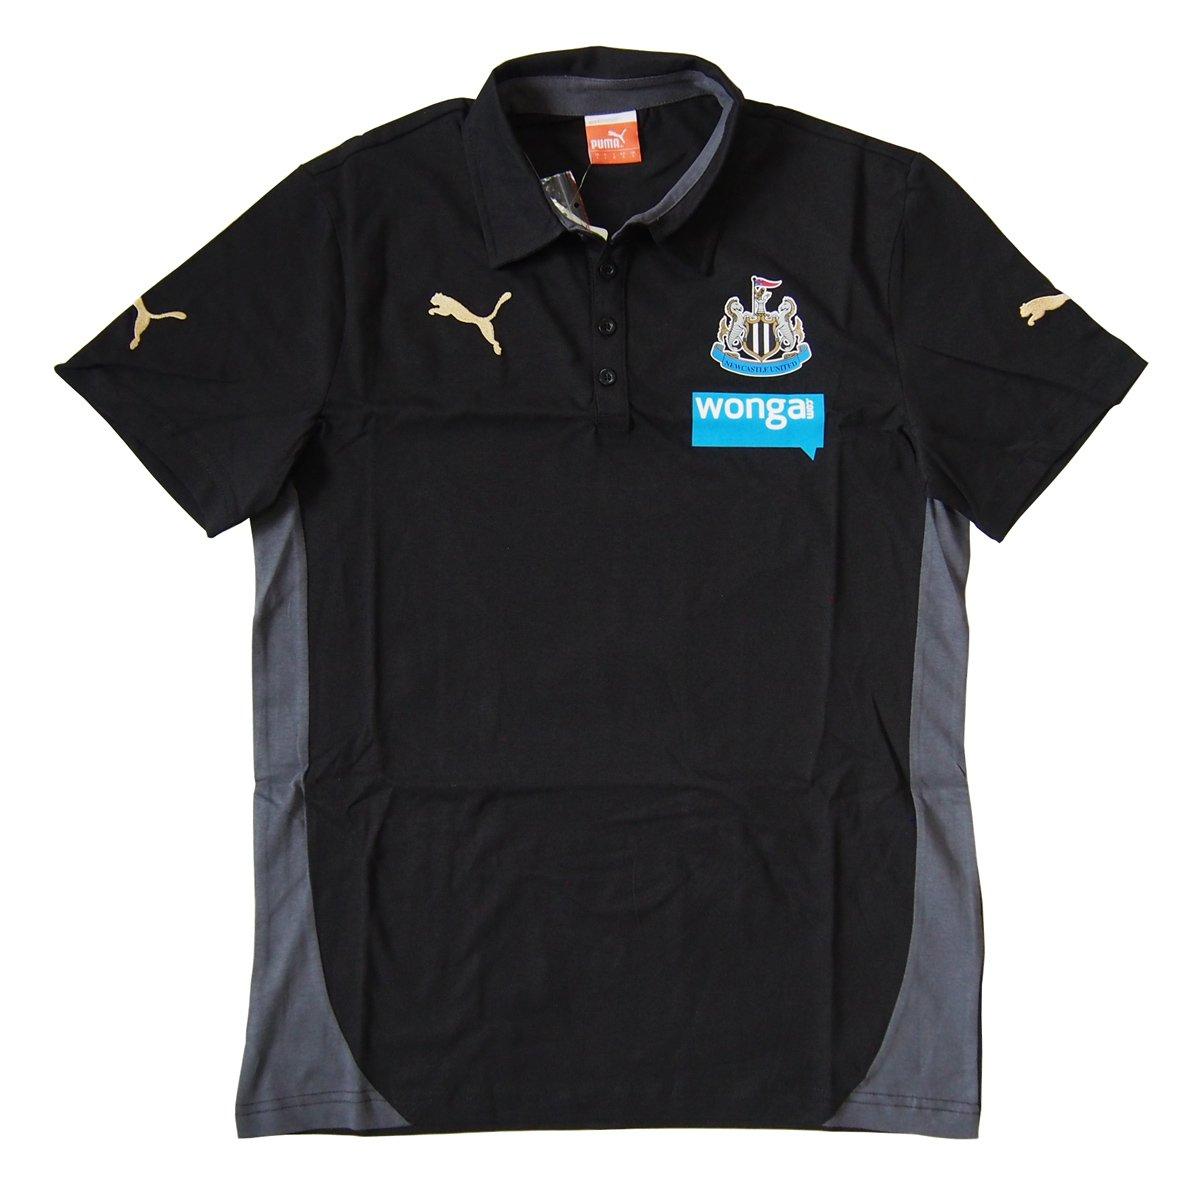 Newcastle United Polo Shirt 2014-2015 (Black)-Small Adults